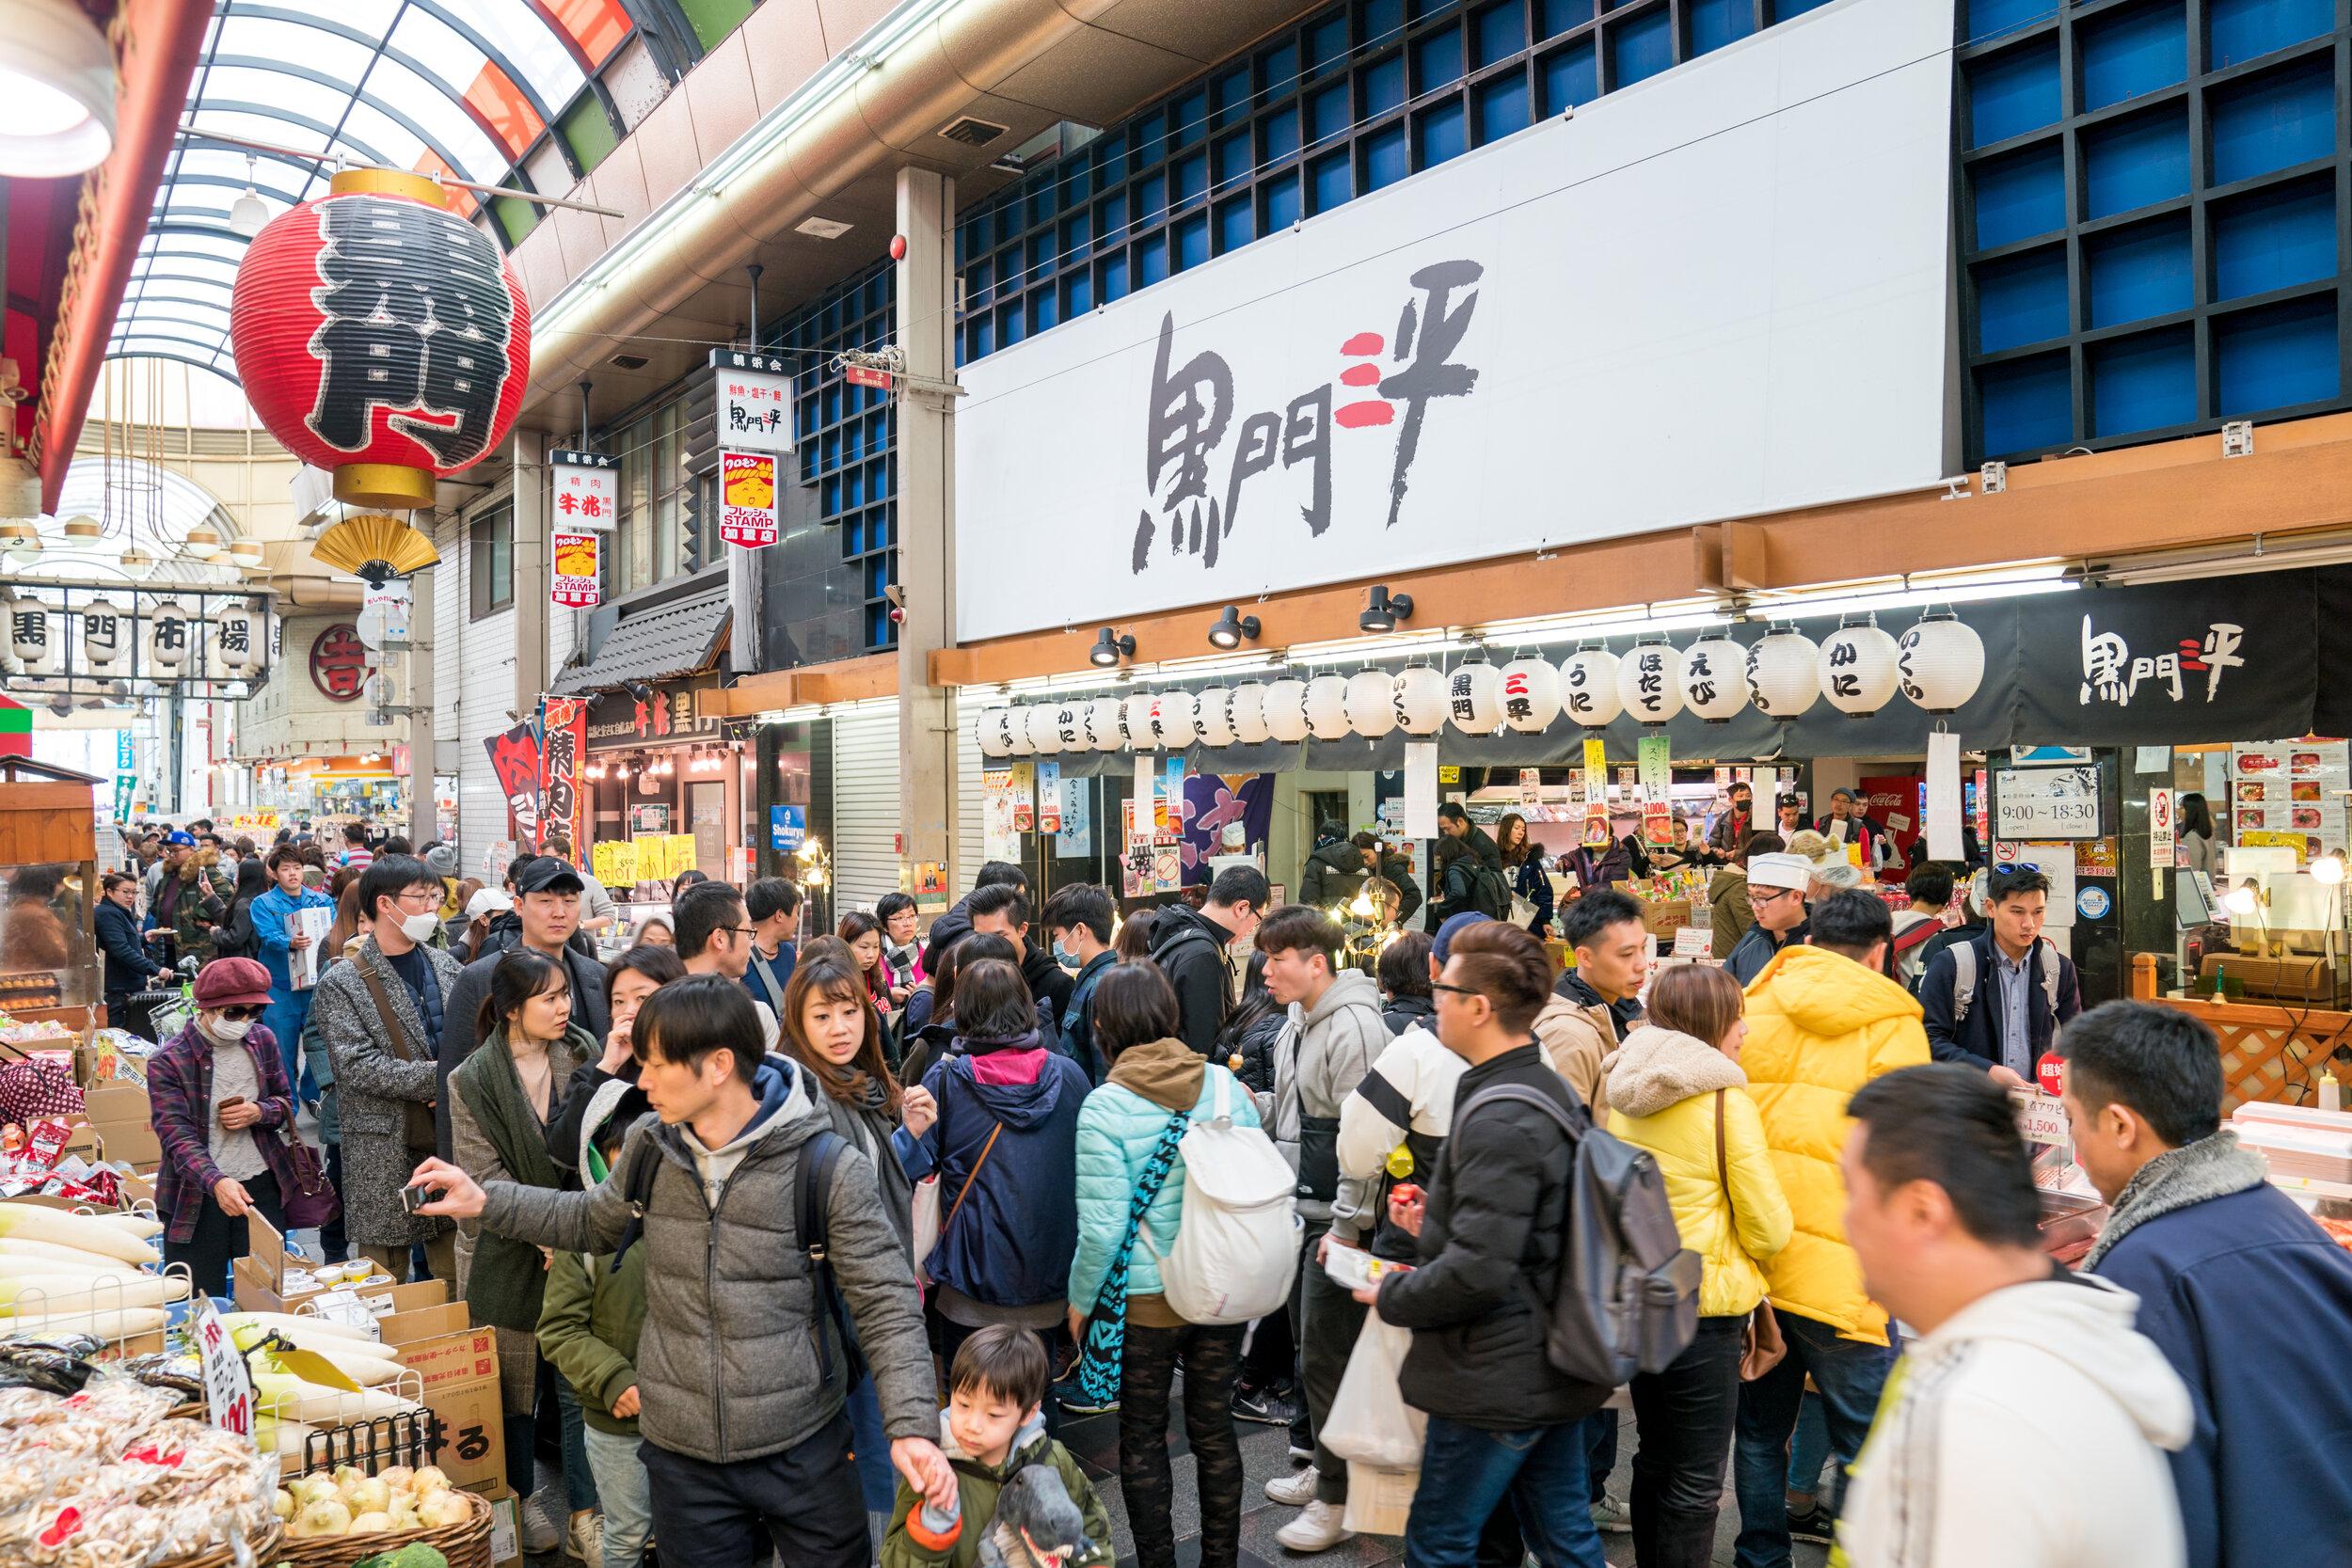 Kuromon Ichiba market is a popular place for Osaka street food.